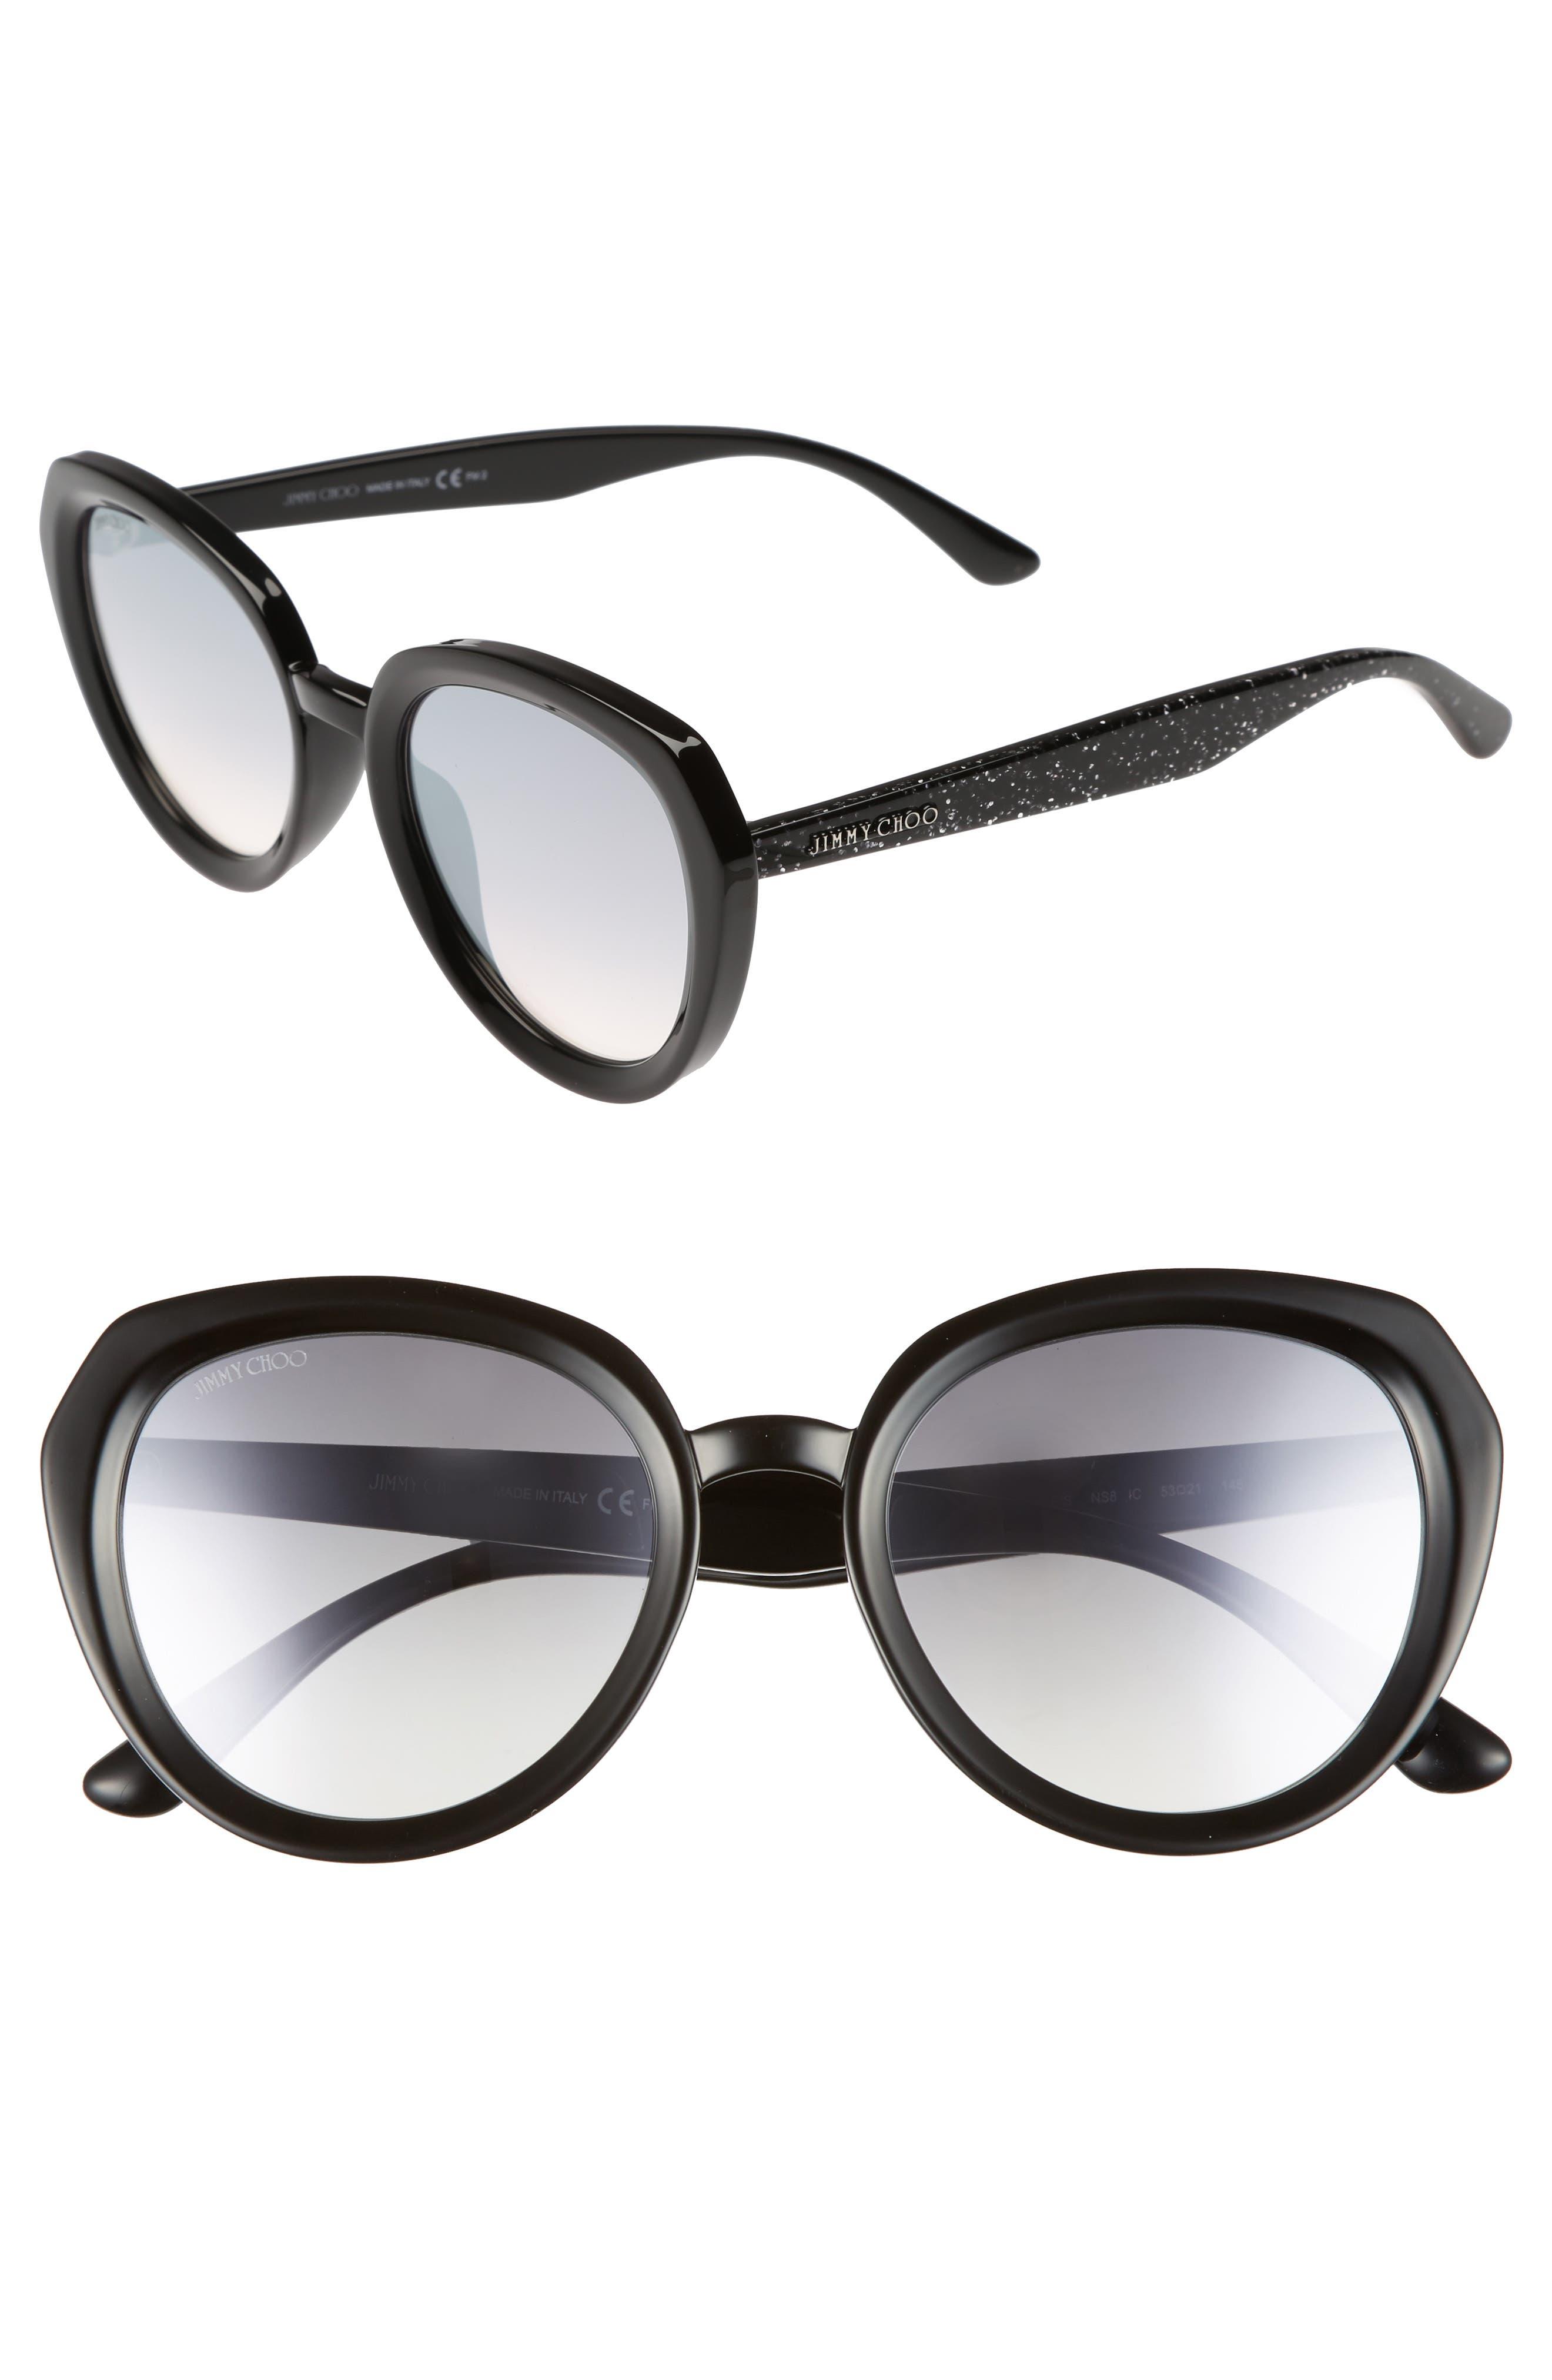 Maces 53mm Oversize Sunglasses,                         Main,                         color, BLACK GLITTER